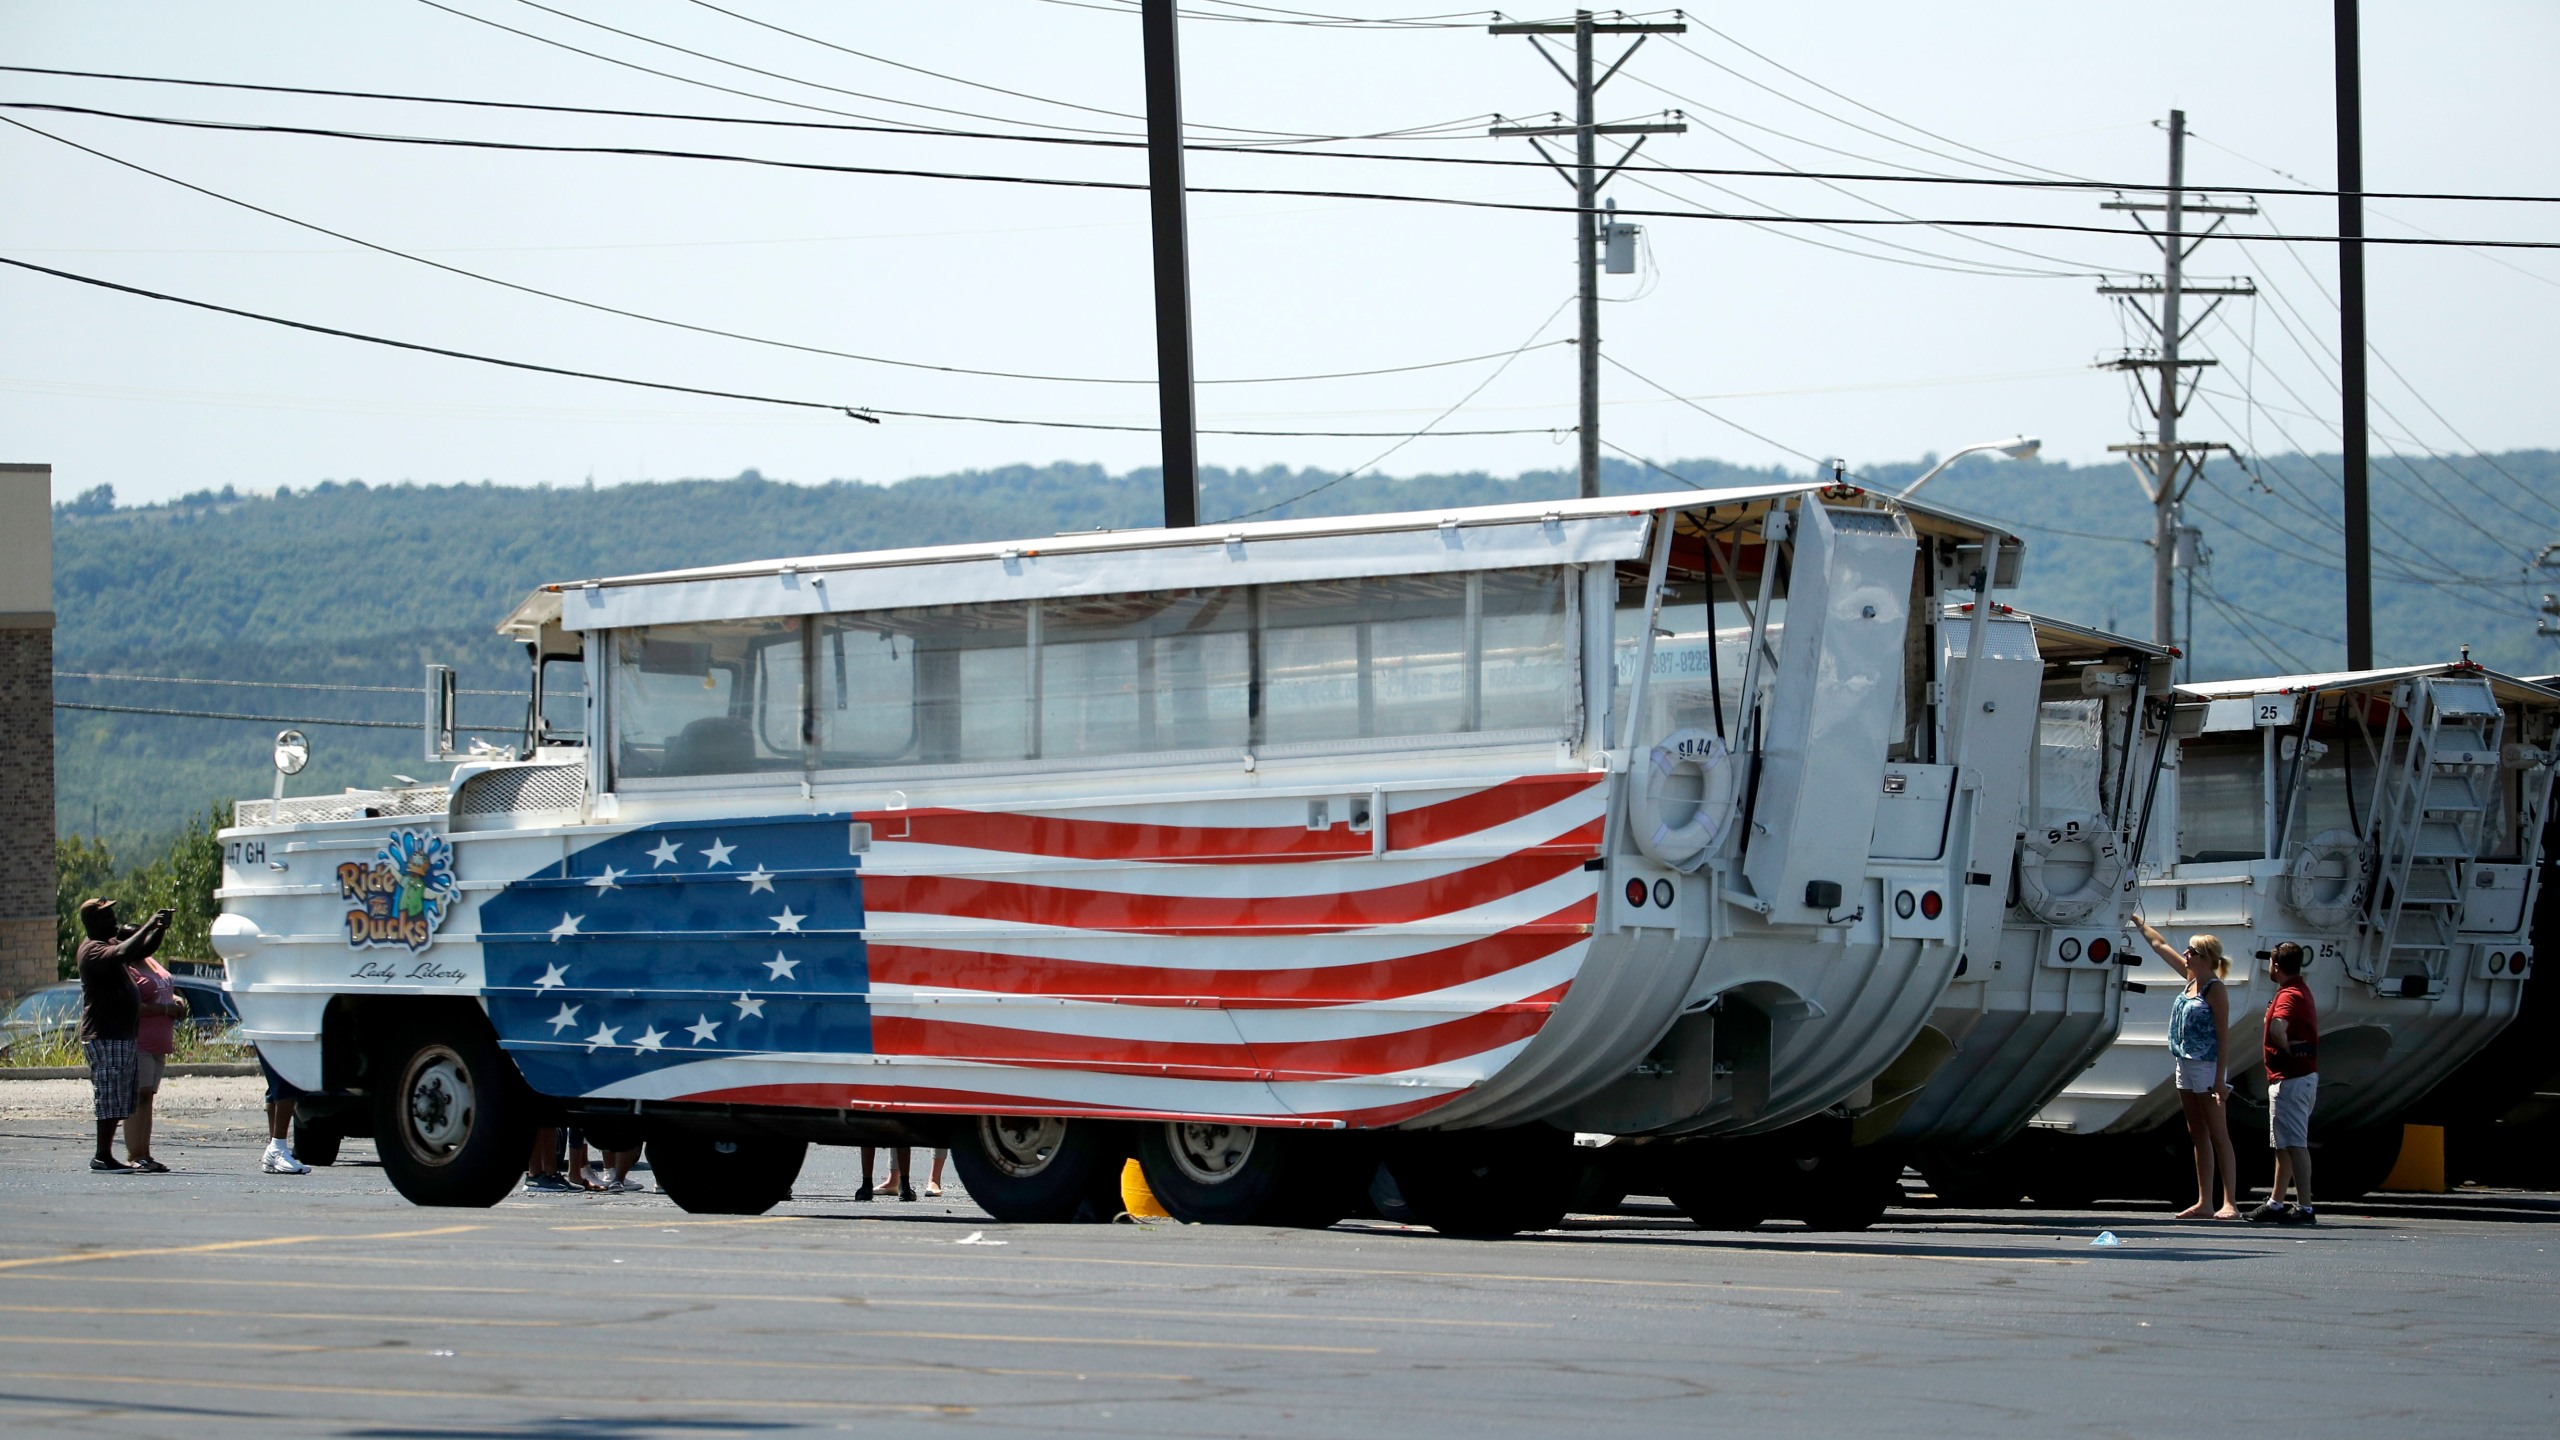 Missouri_Boat_Accident_56478-159532.jpg23729650